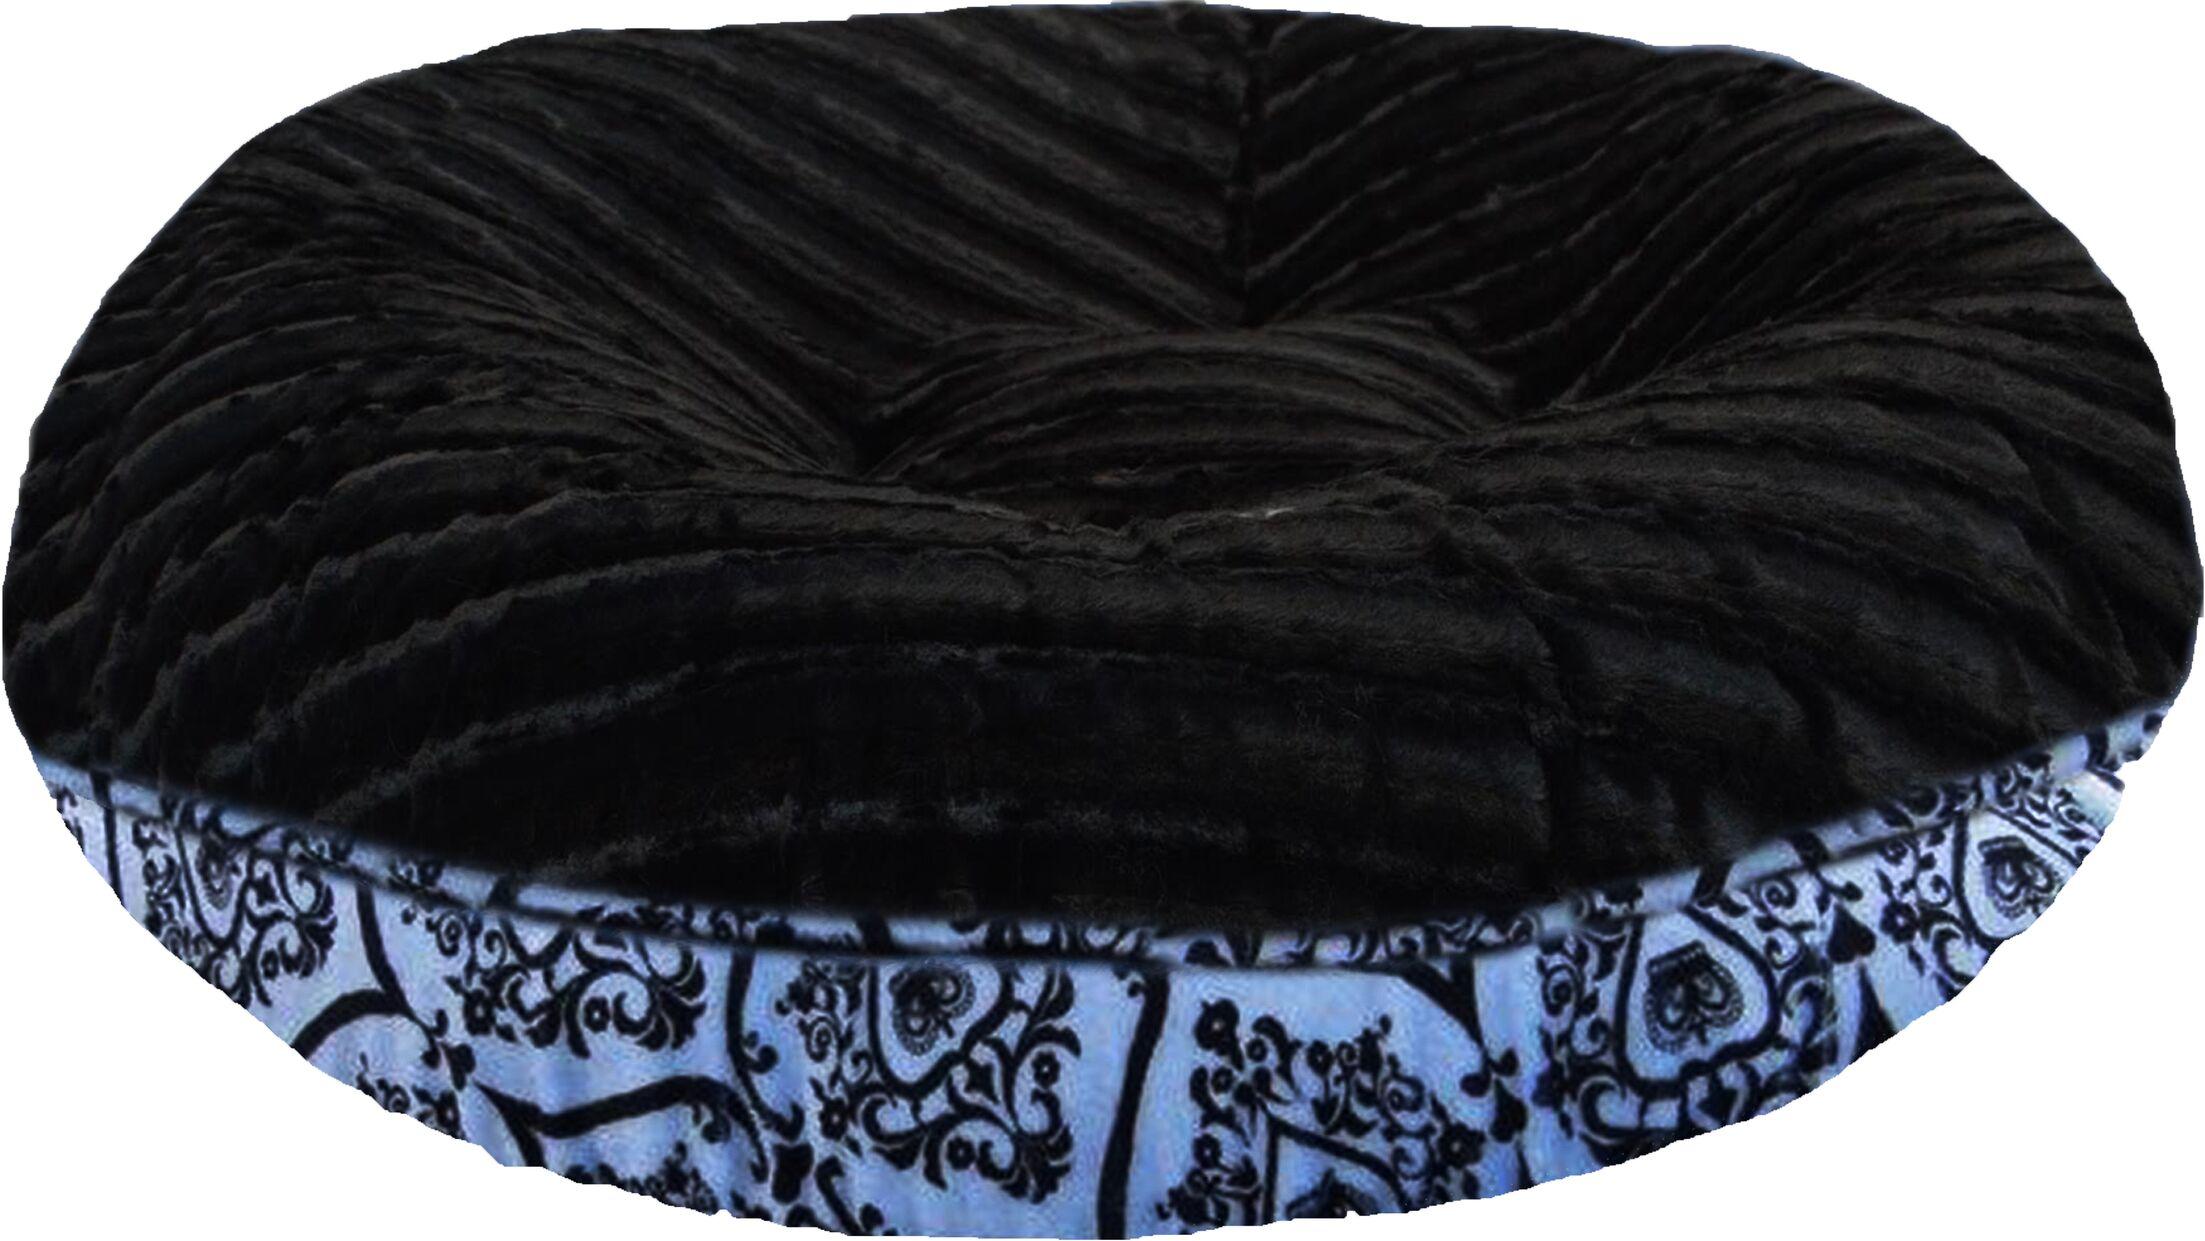 Puma Versailles Bagel Pillow Bed